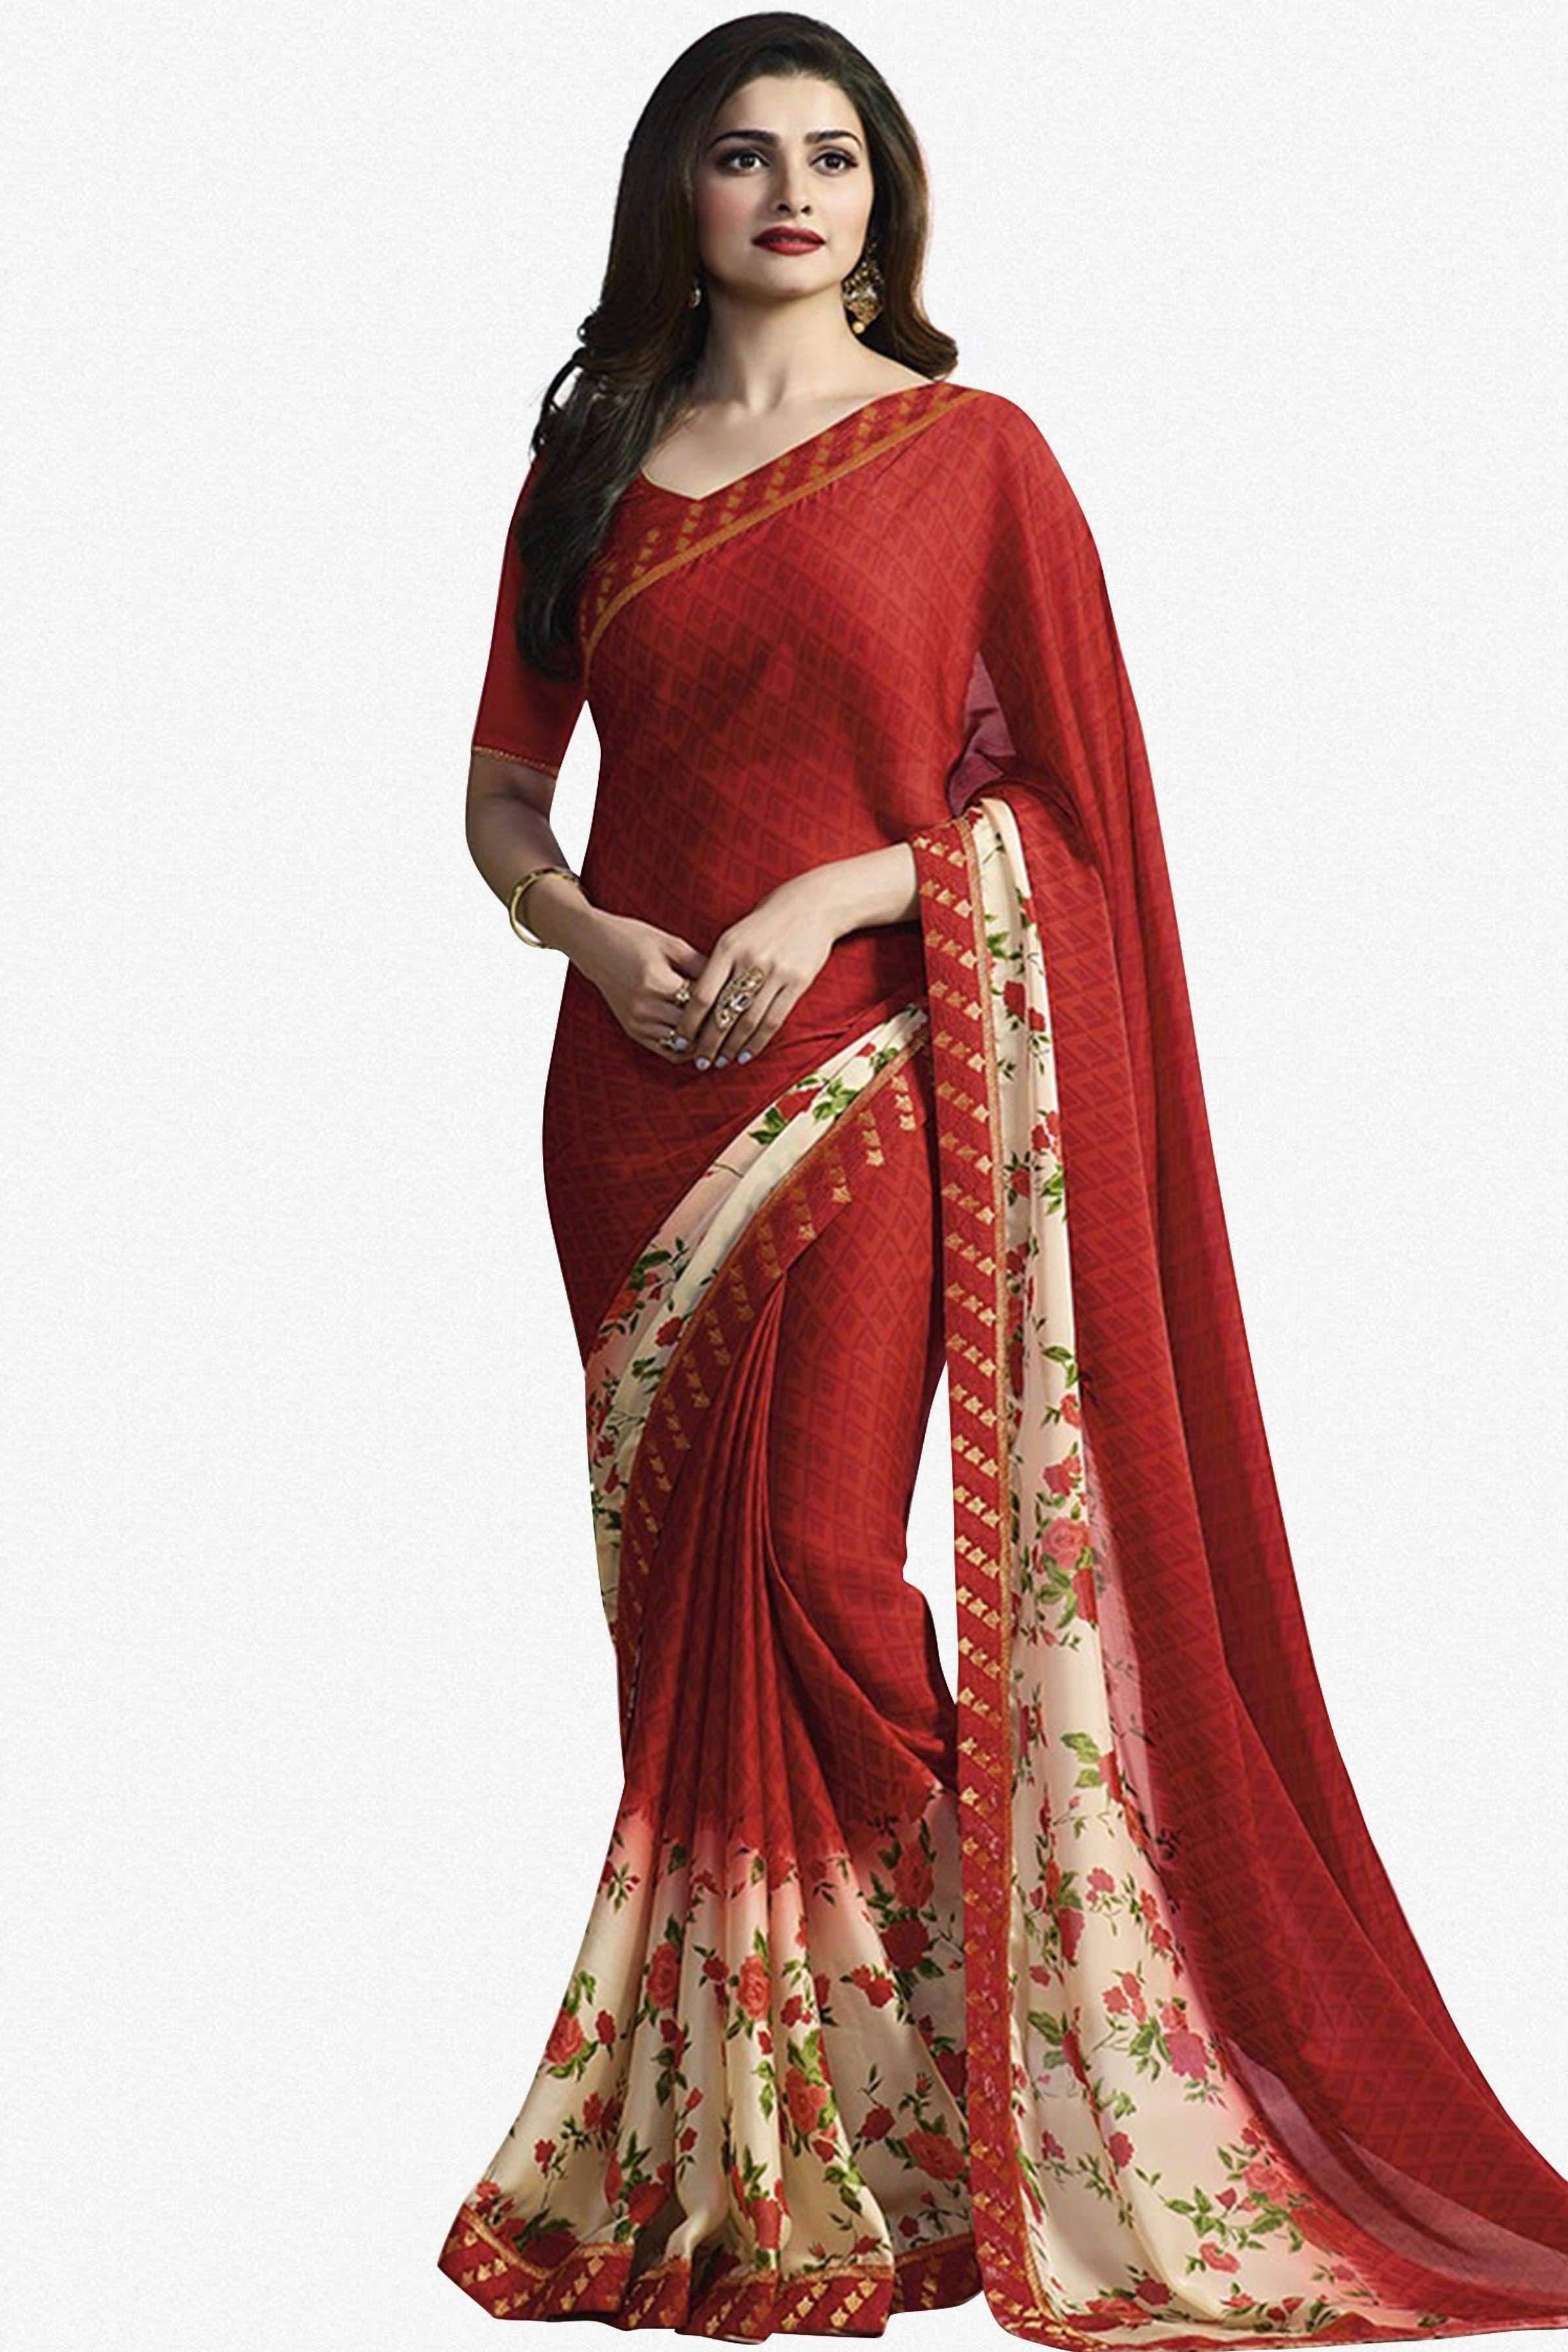 67096fc37e Designer Saree:atisundar wonderful Designer Party Wear Saree Featuring  Prachi Desai in Red - 13733